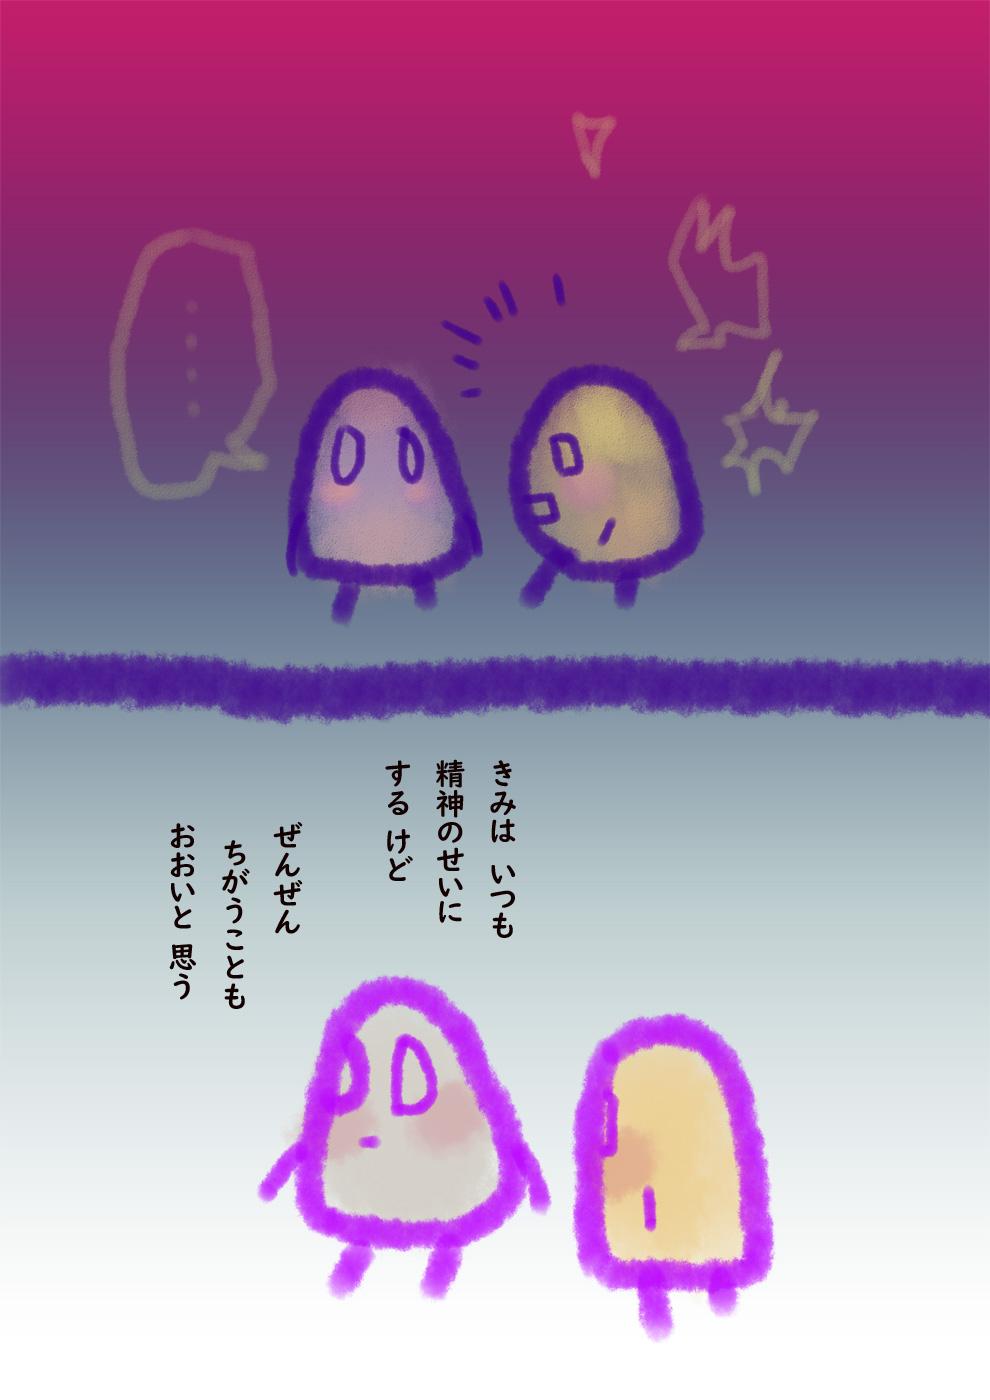 http://ahito.com/comic/short/nega/img/2018/20180312/01.jpg